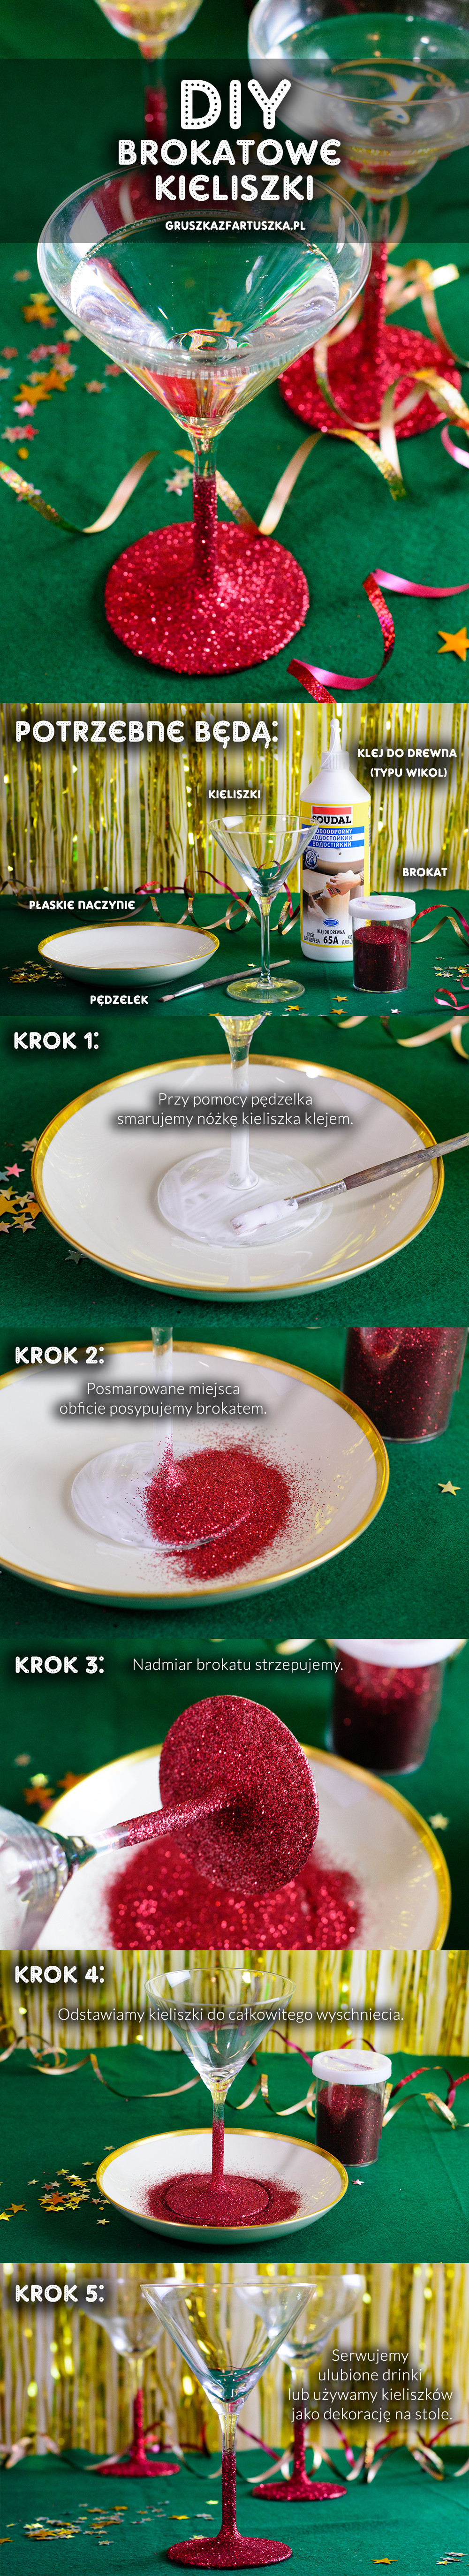 brokatowe kieliszki DIY